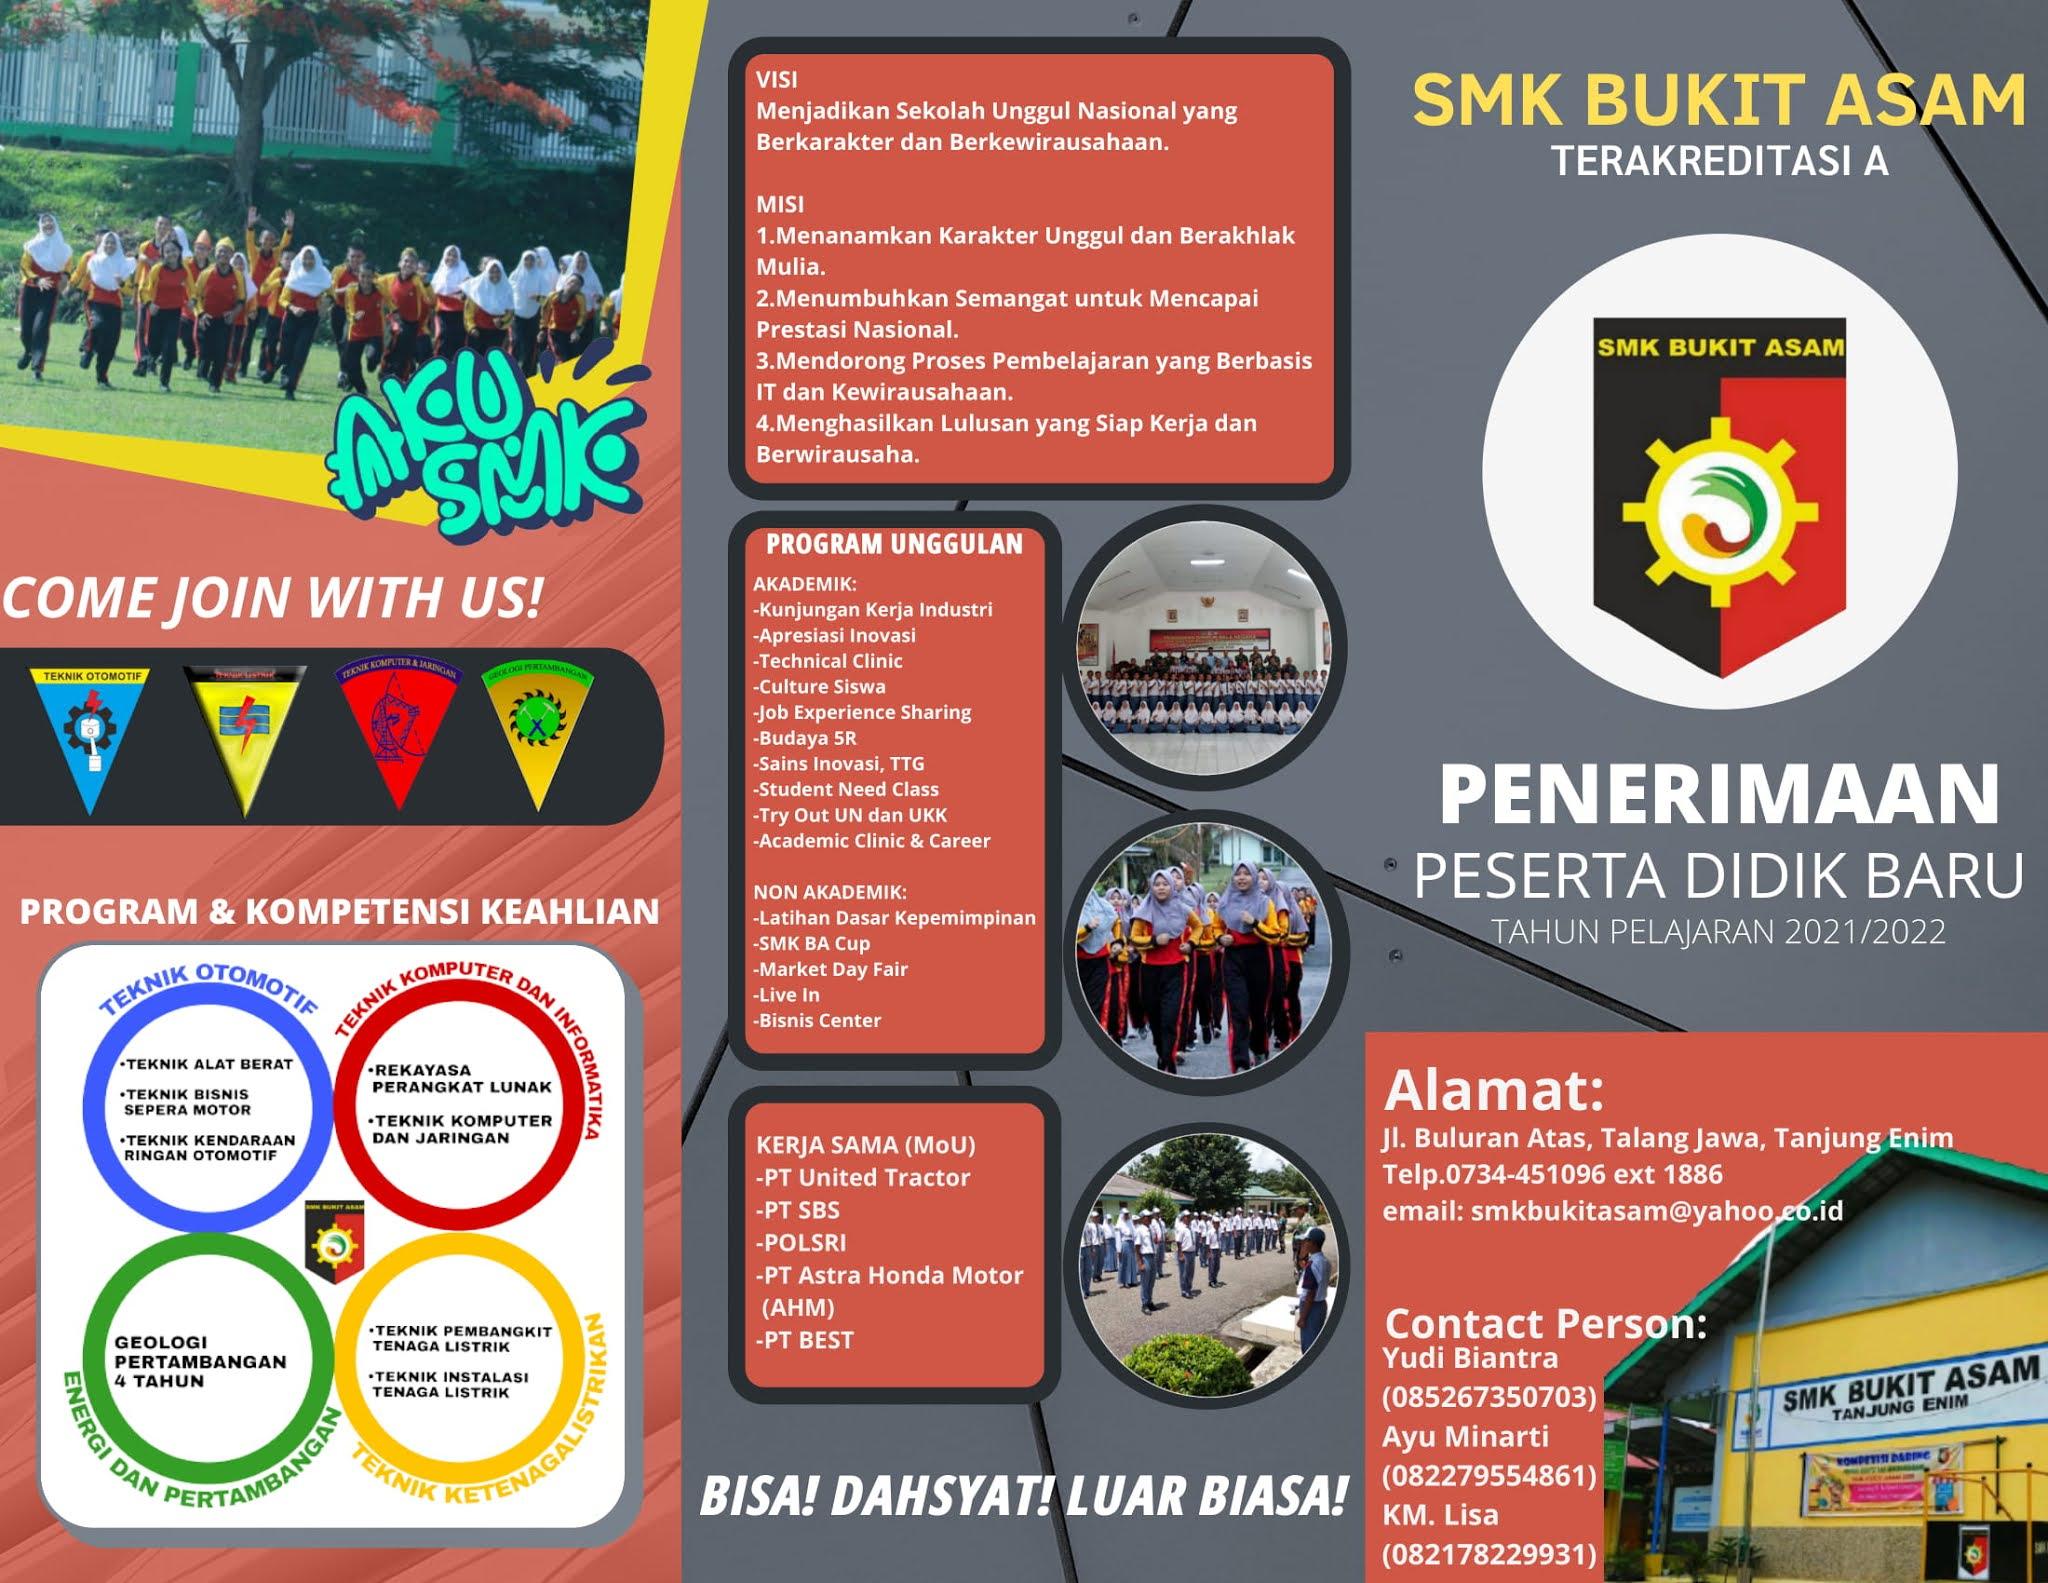 PPDB Jalur Reguler SMK Bukit Asam Tahun 2021